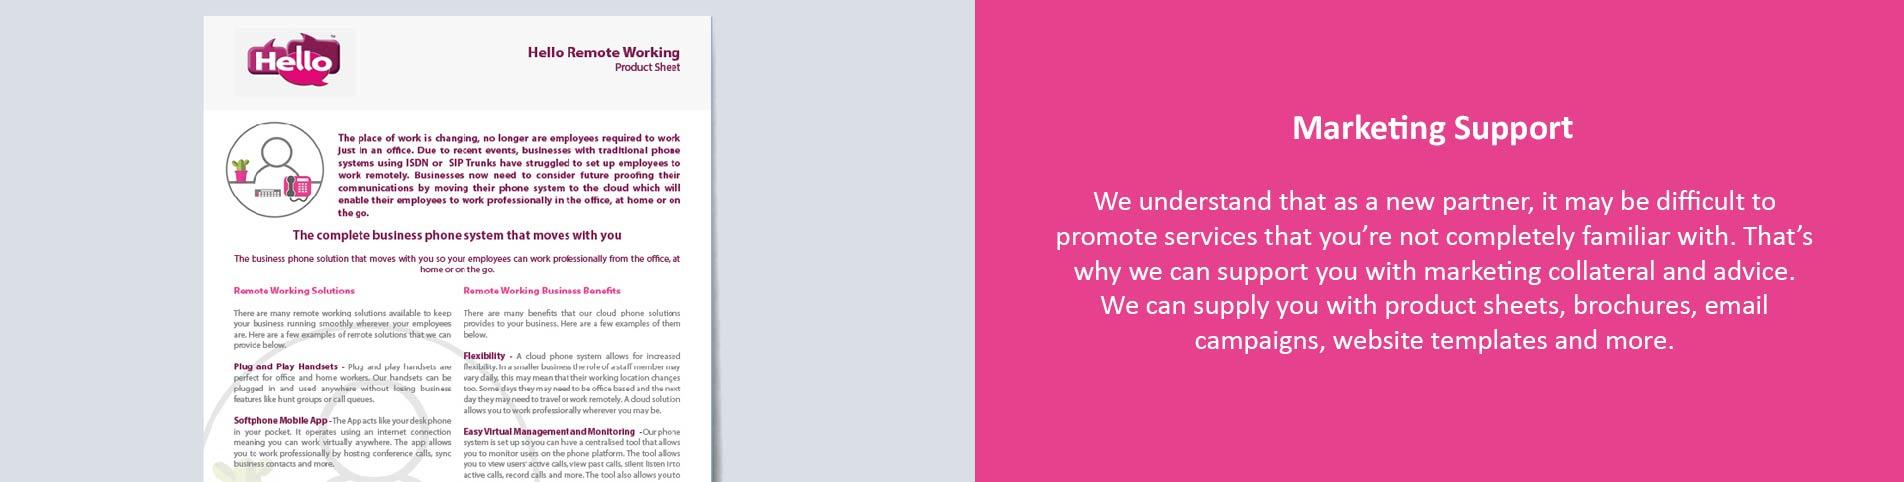 Hello Telecom VoIP partner program marketing support